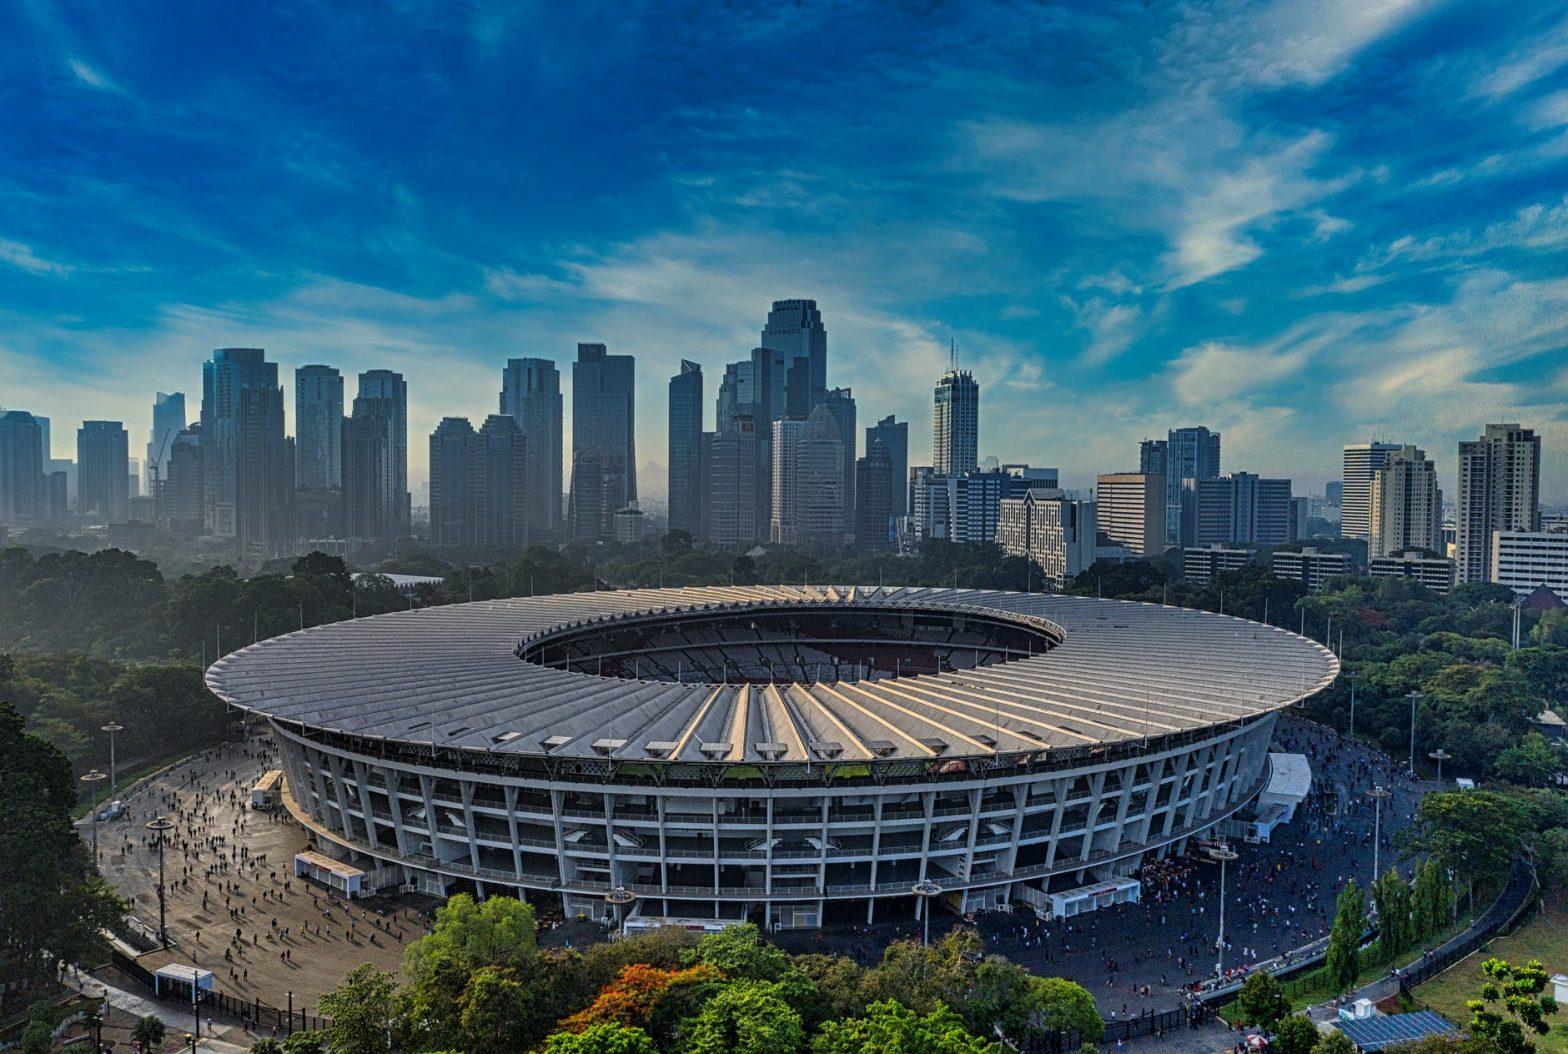 bird s eye view of city during daytime